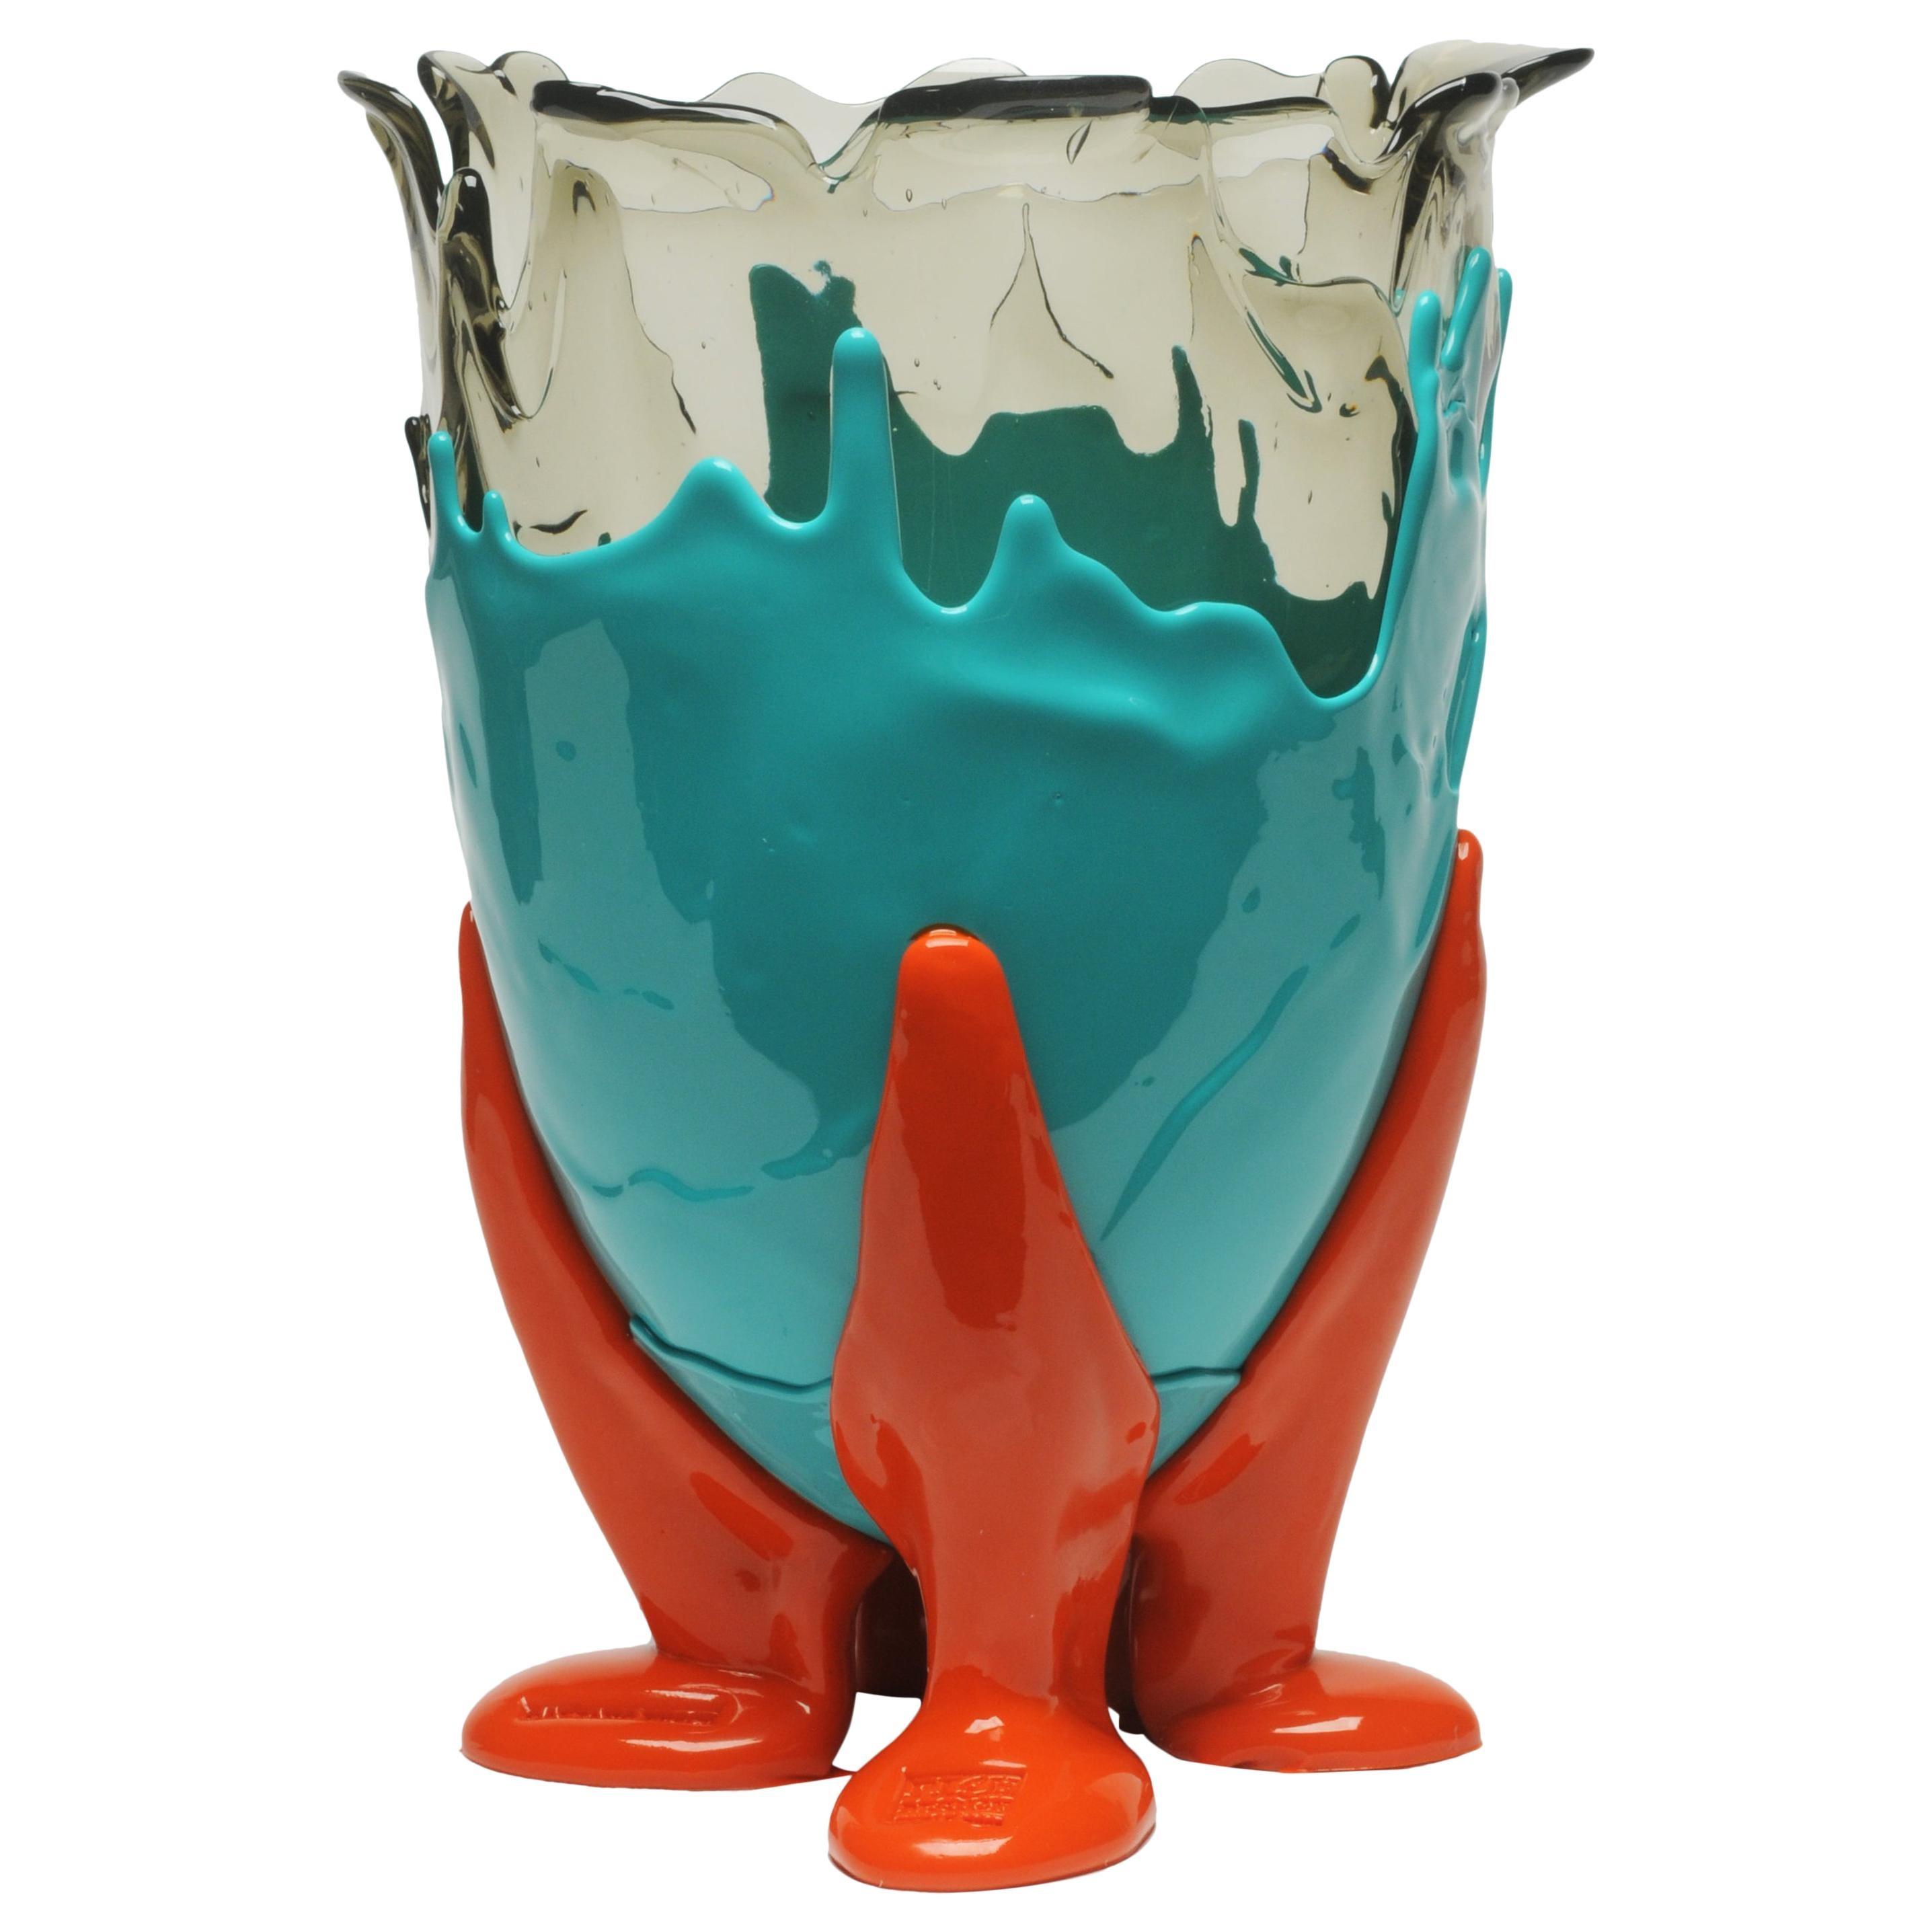 21th Century Gaetano Pesce Clear L Vase Soft Resin Turquoise Orange